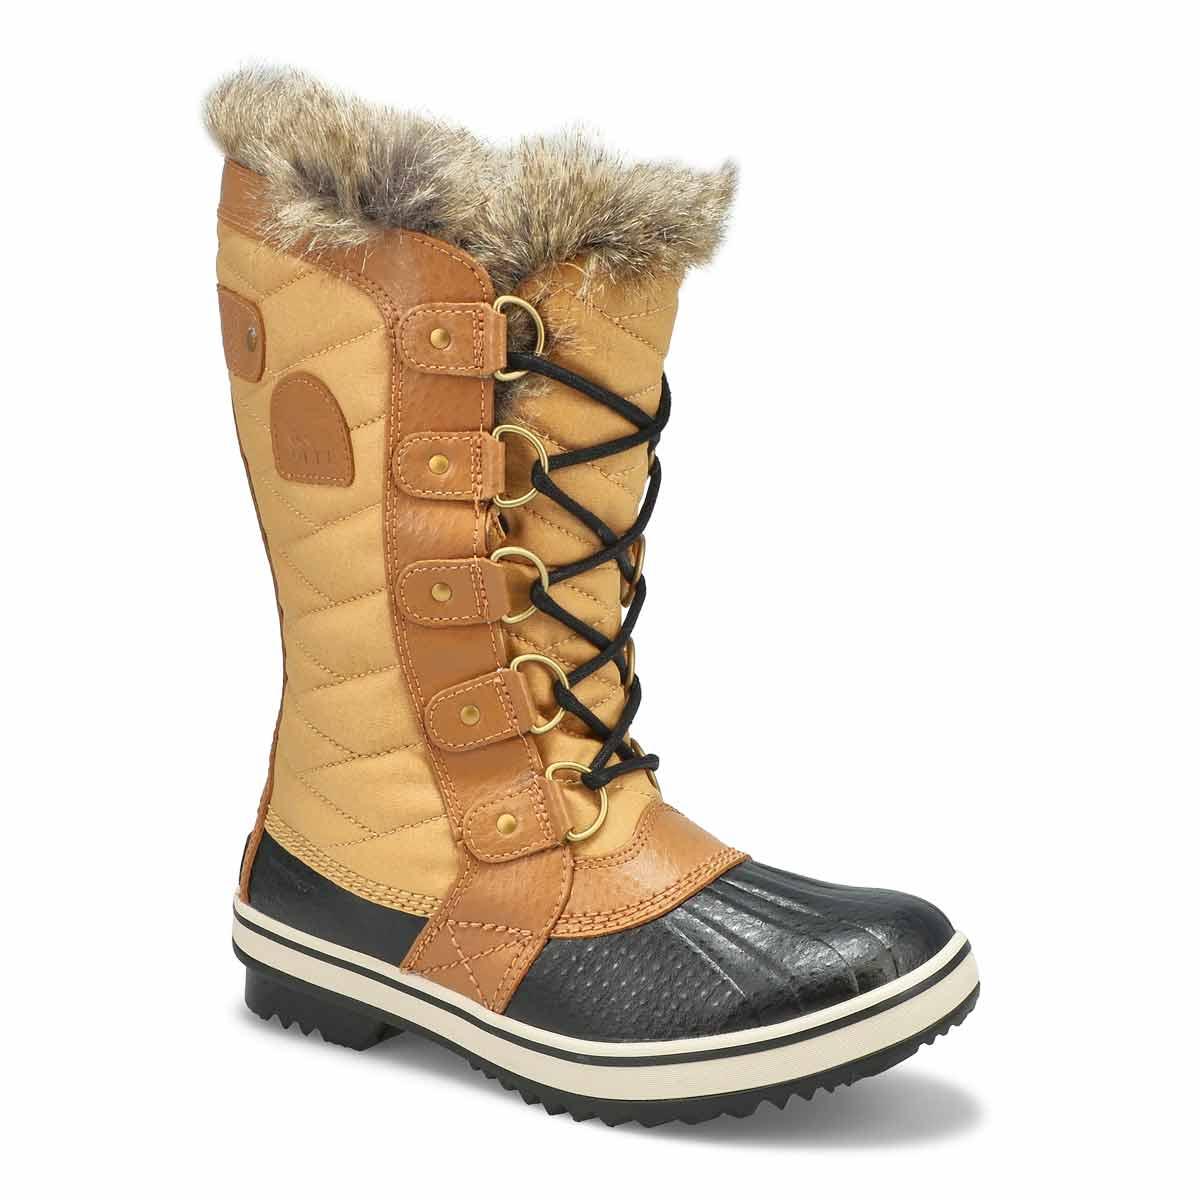 Women's TOFINO II curry waterproof boots